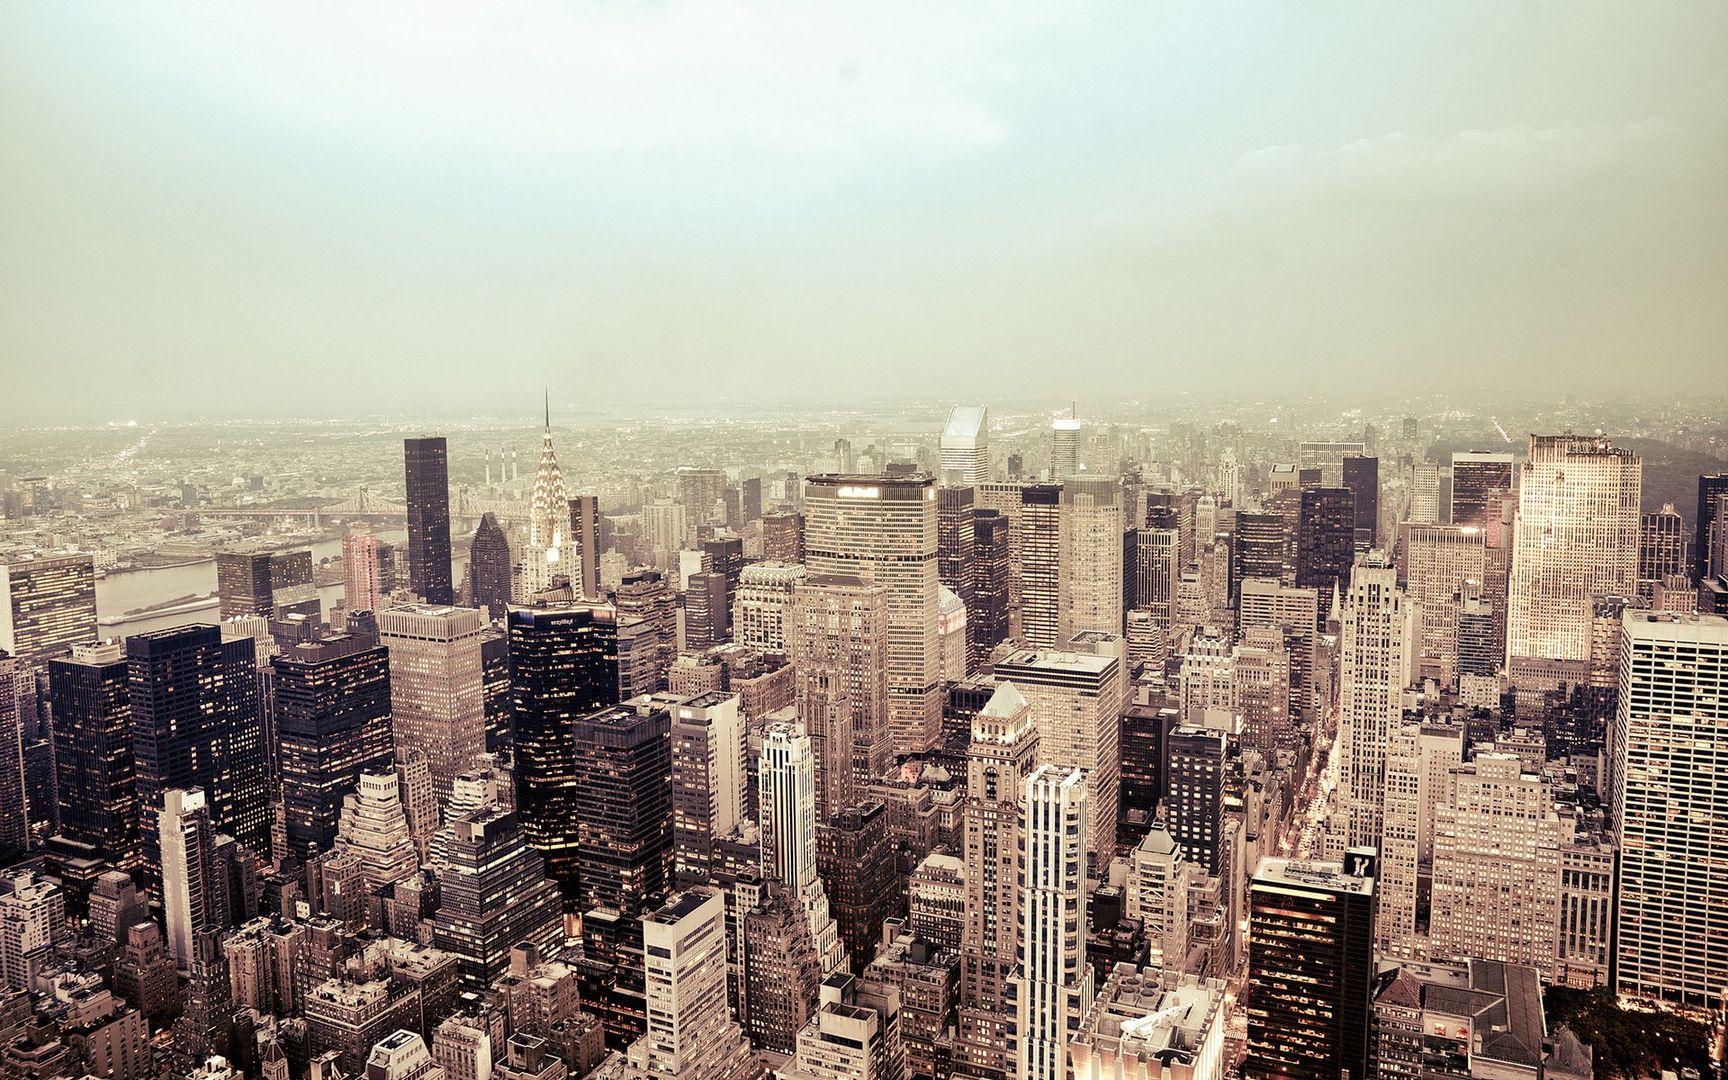 Download New York cityscape wallpaper 1728x1080